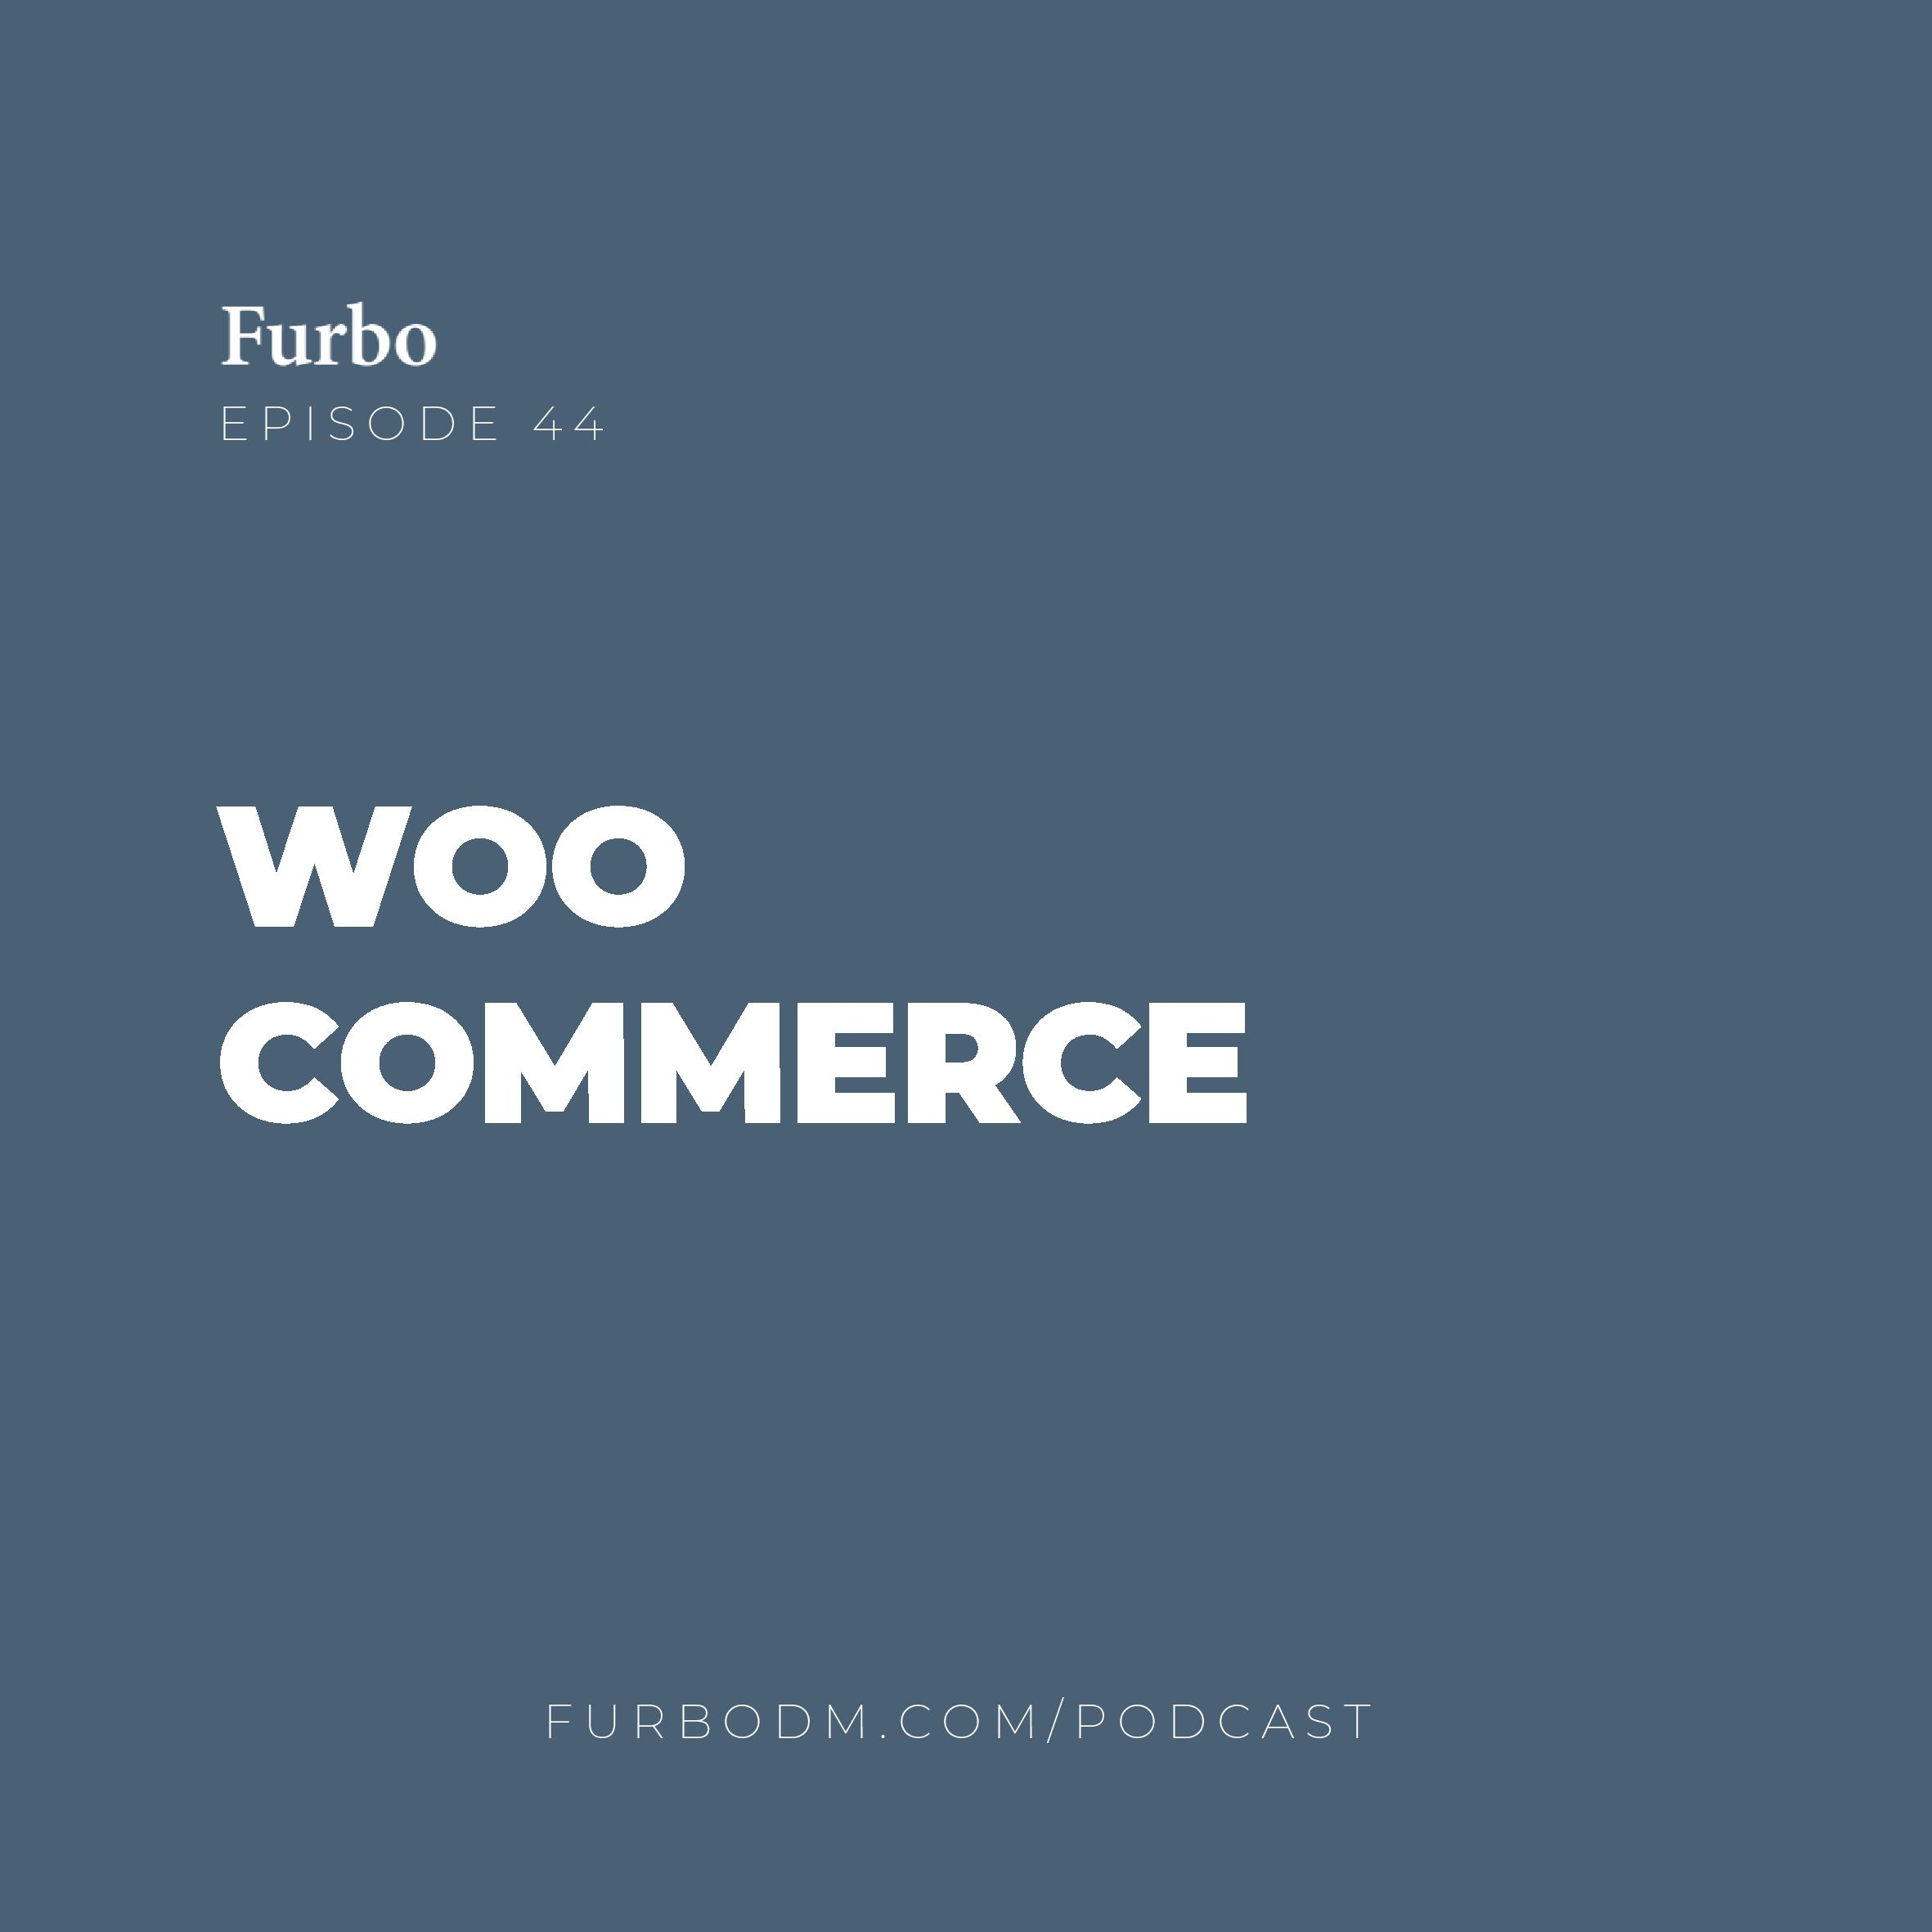 E44: WooCommerce | با ووکامرس همین الان فروشگاه اینترنتی خودتون رو راهاندازی کنید